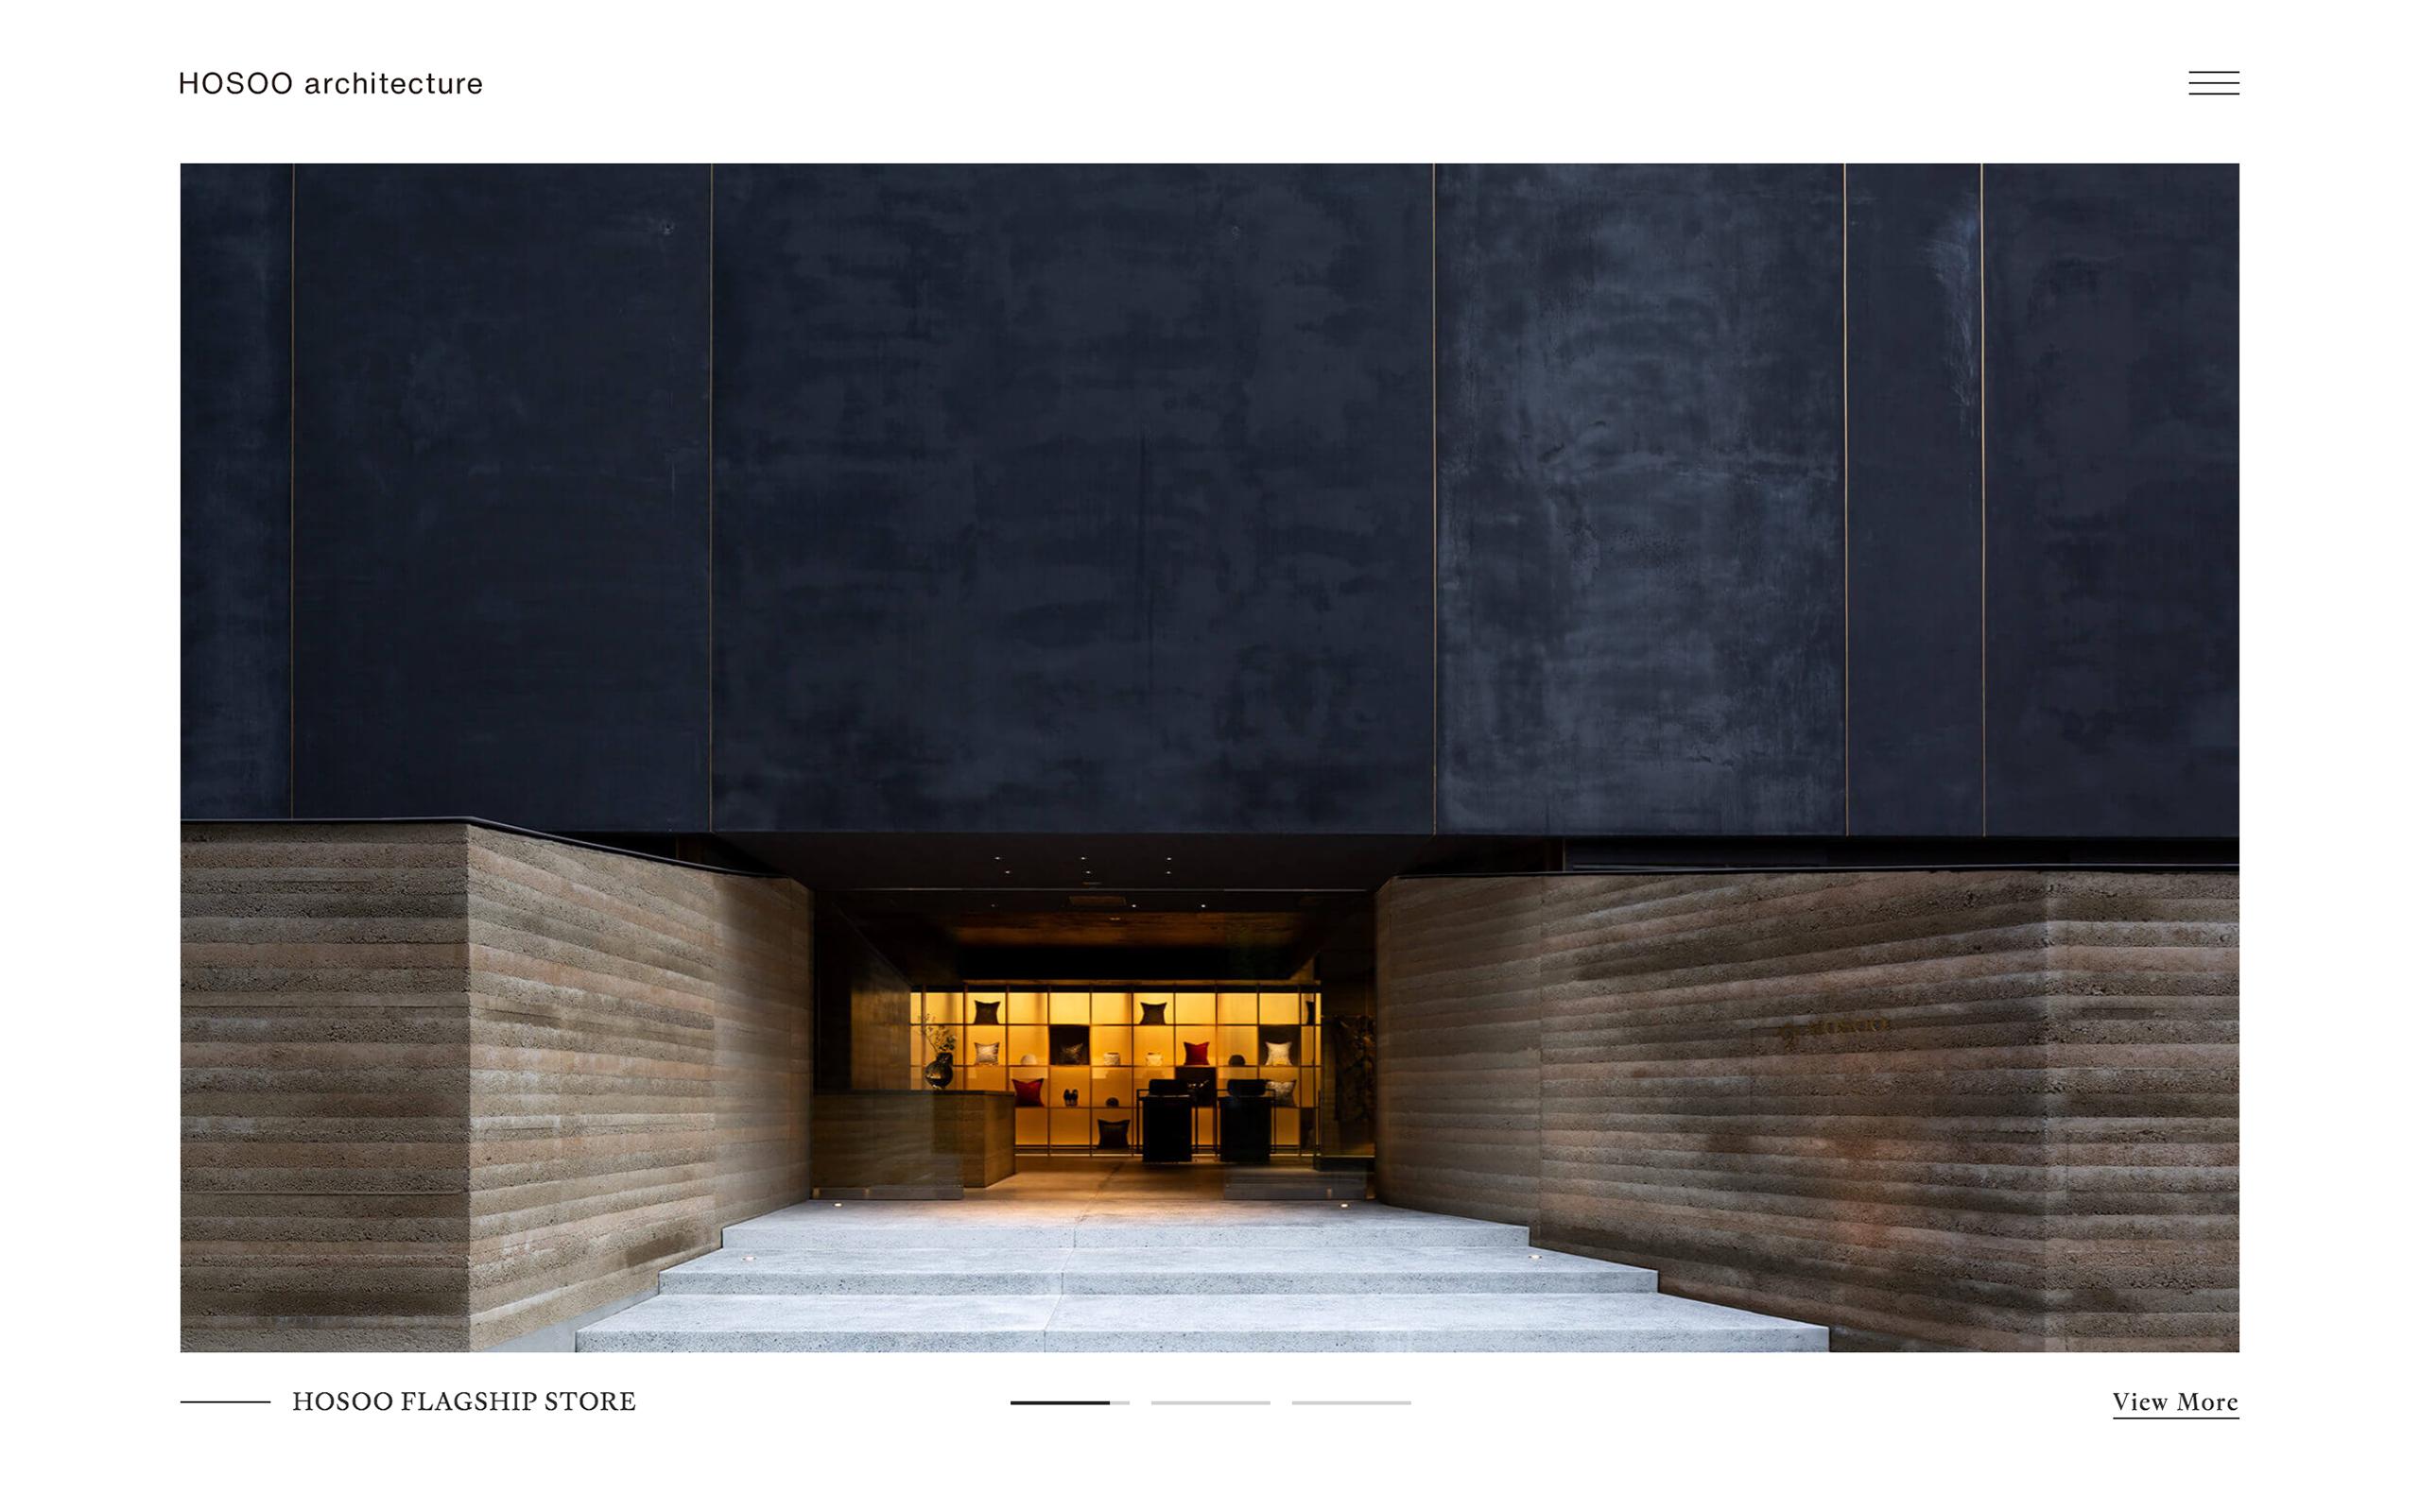 HOSOO architecture